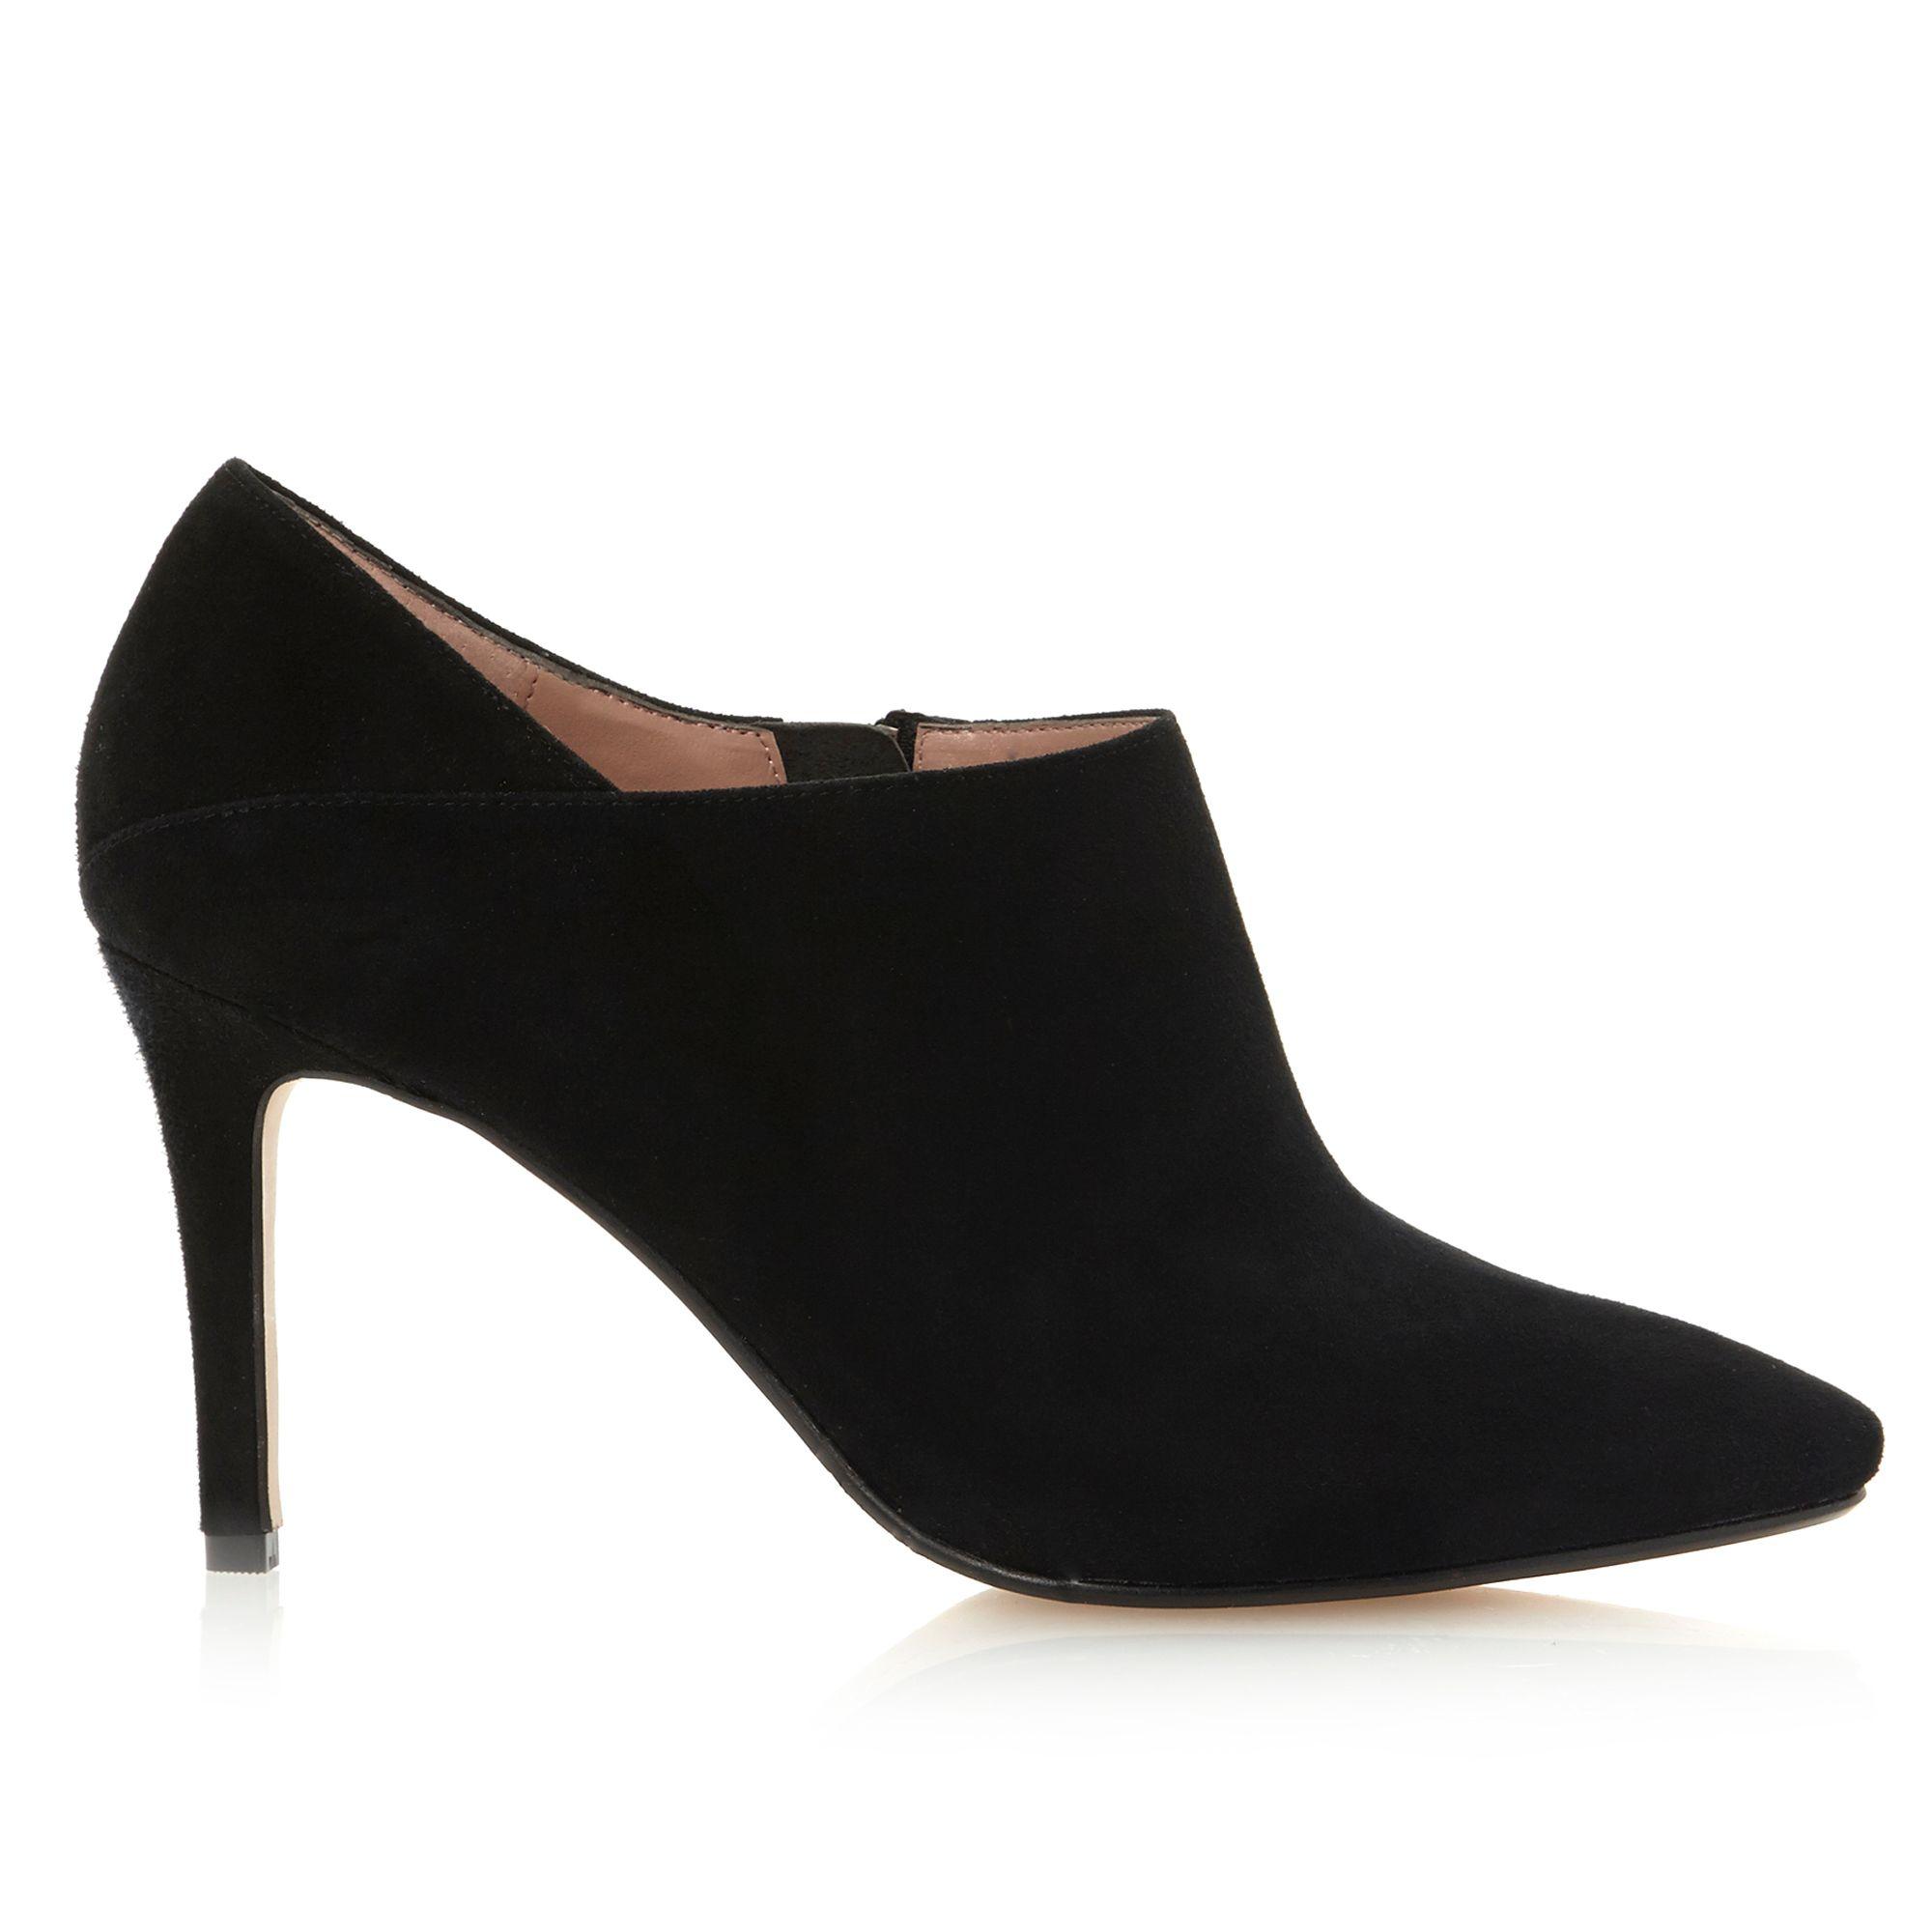 dune avinda simple shoe boots in black black suede lyst